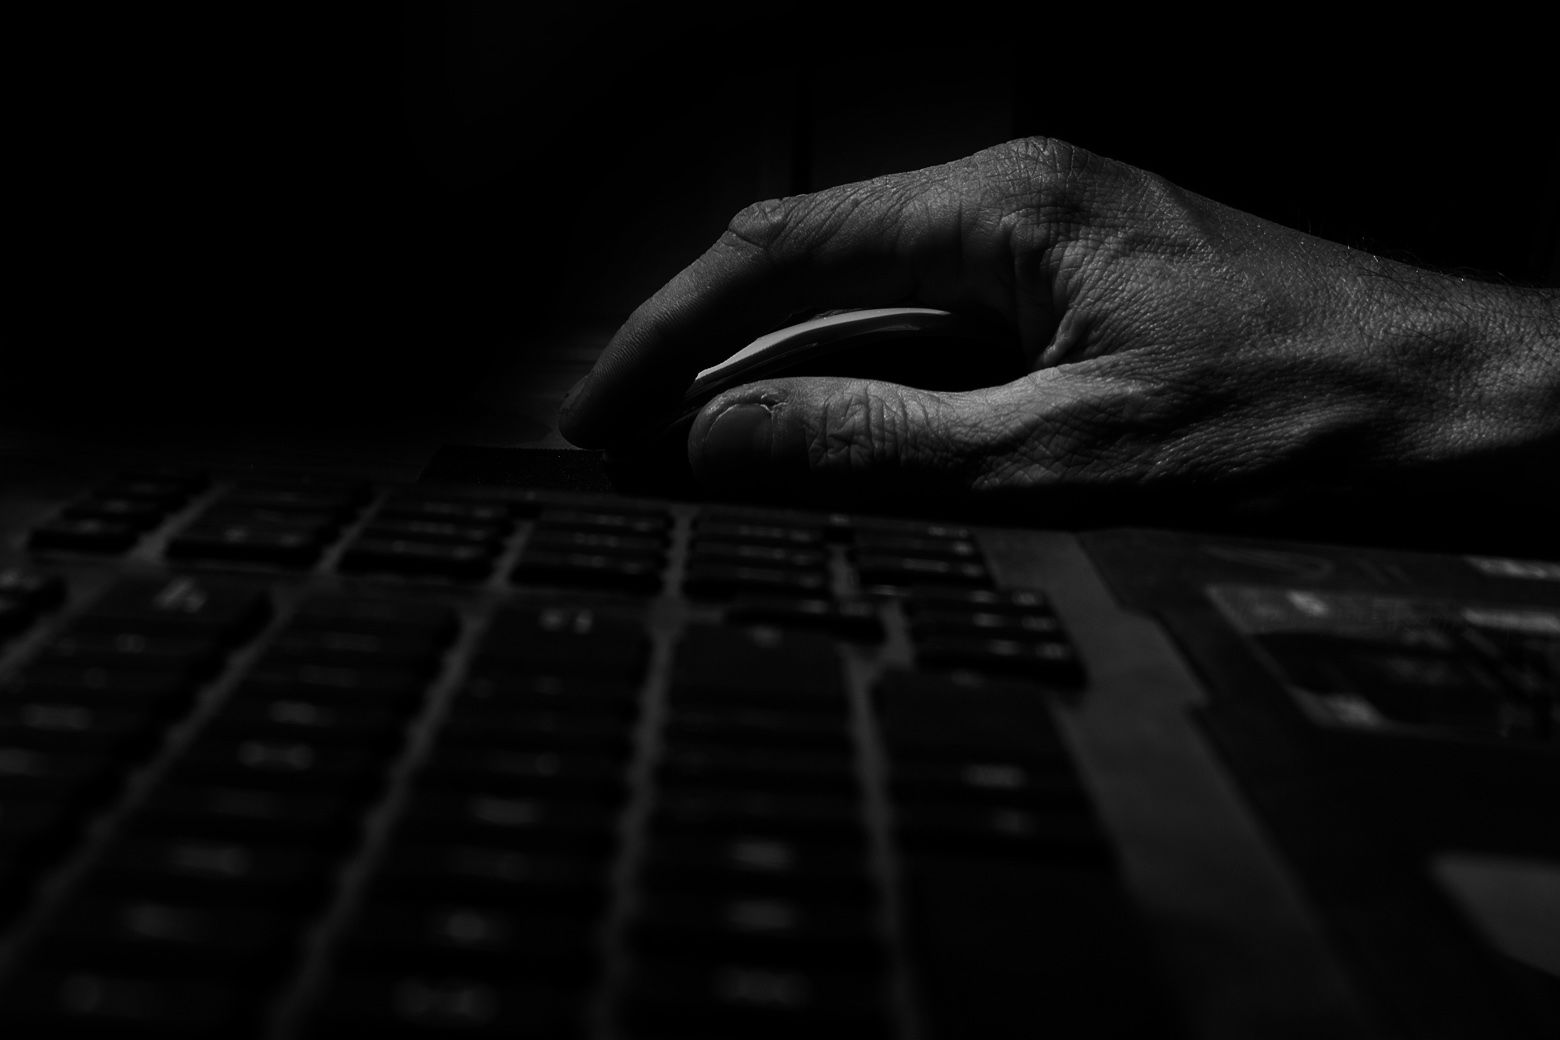 online predator cases